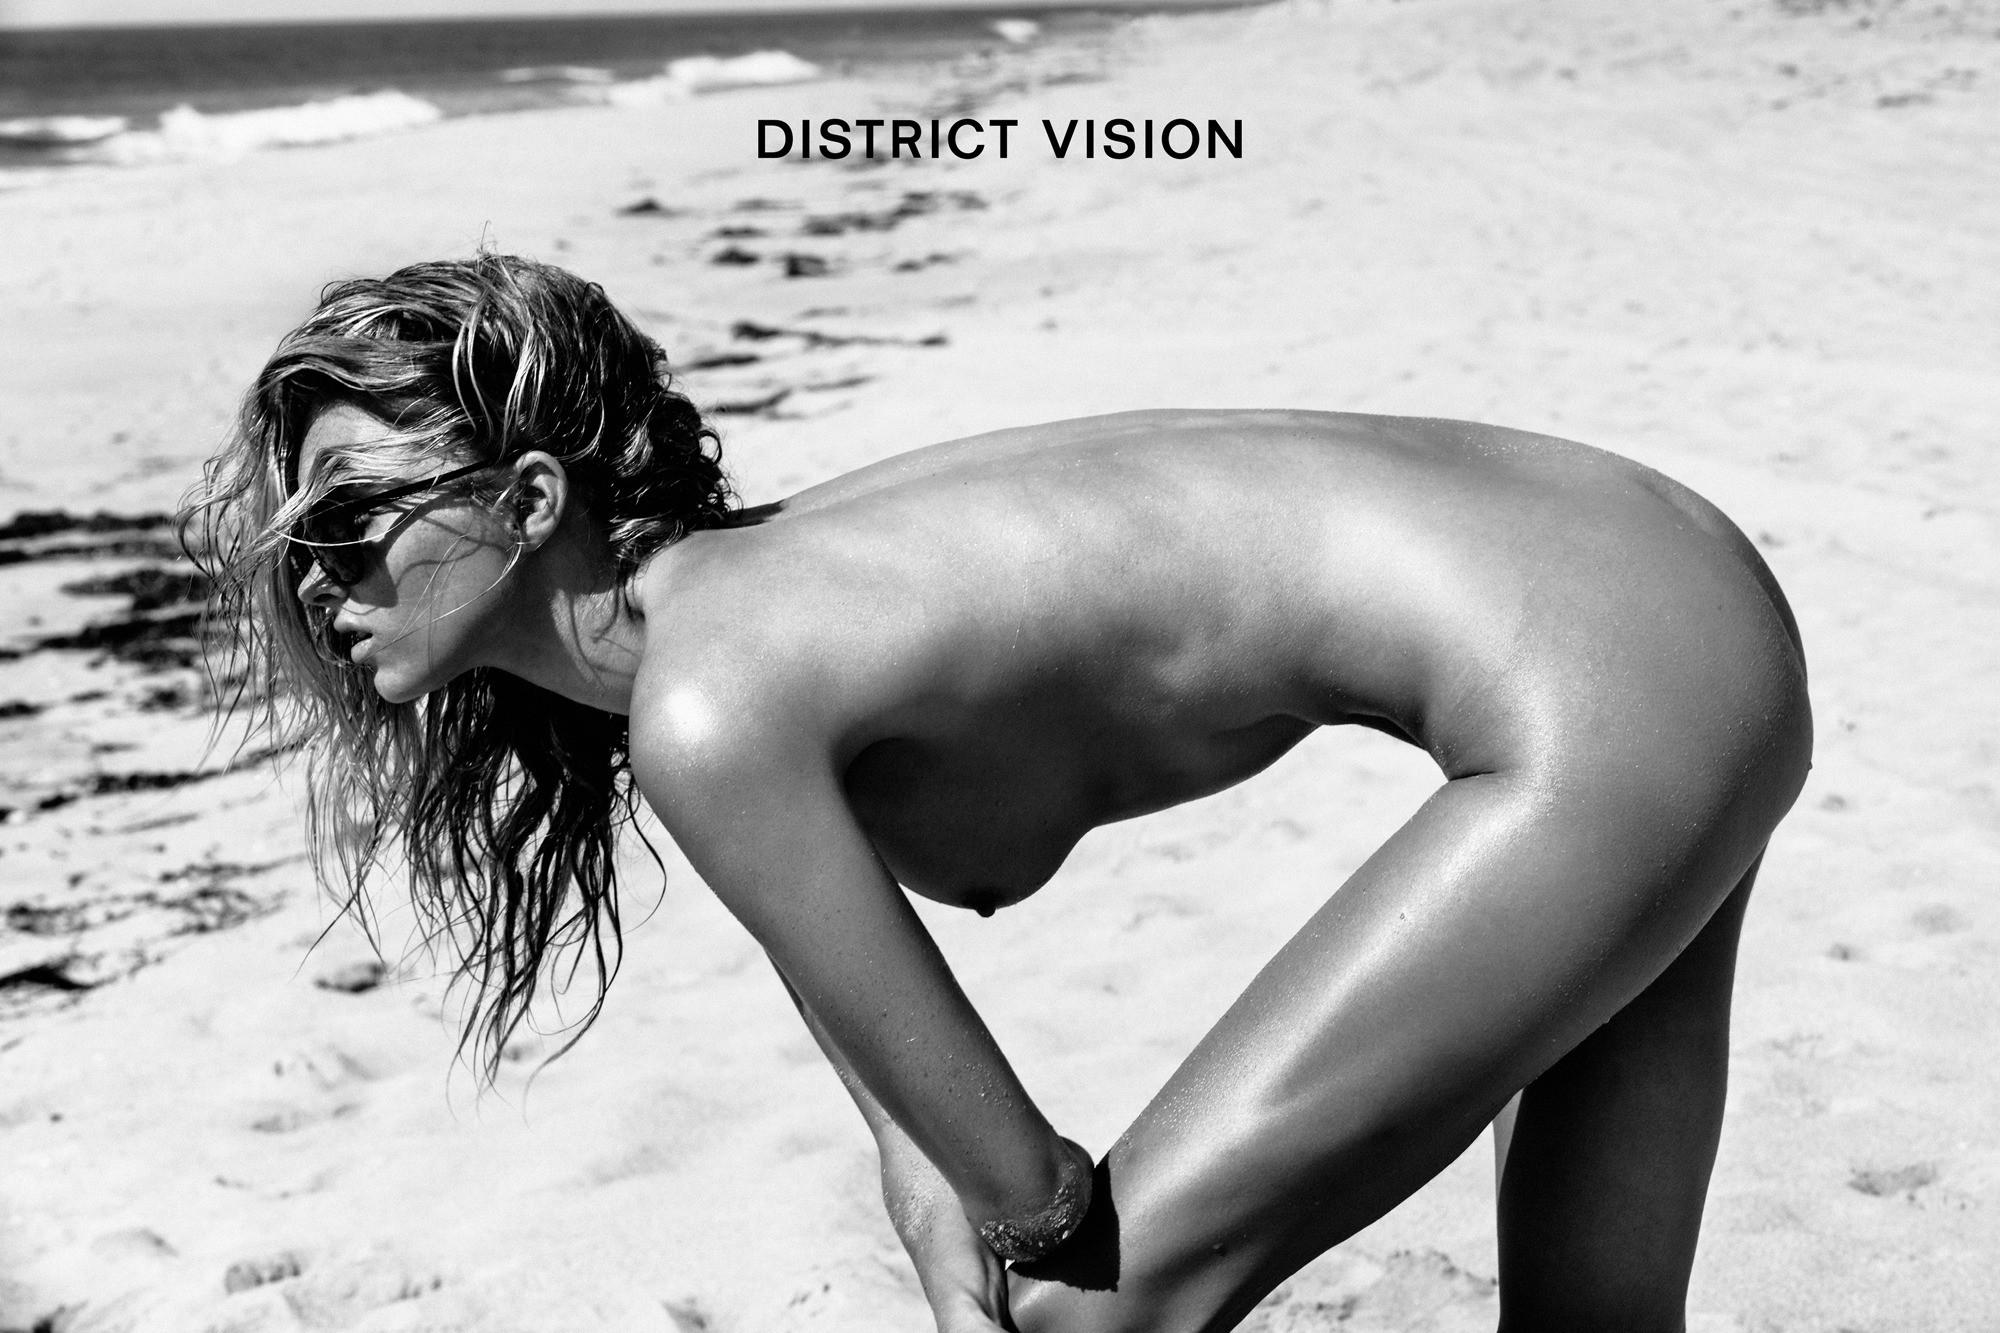 Watch Elsa hosk topless sexy 7 Photos video